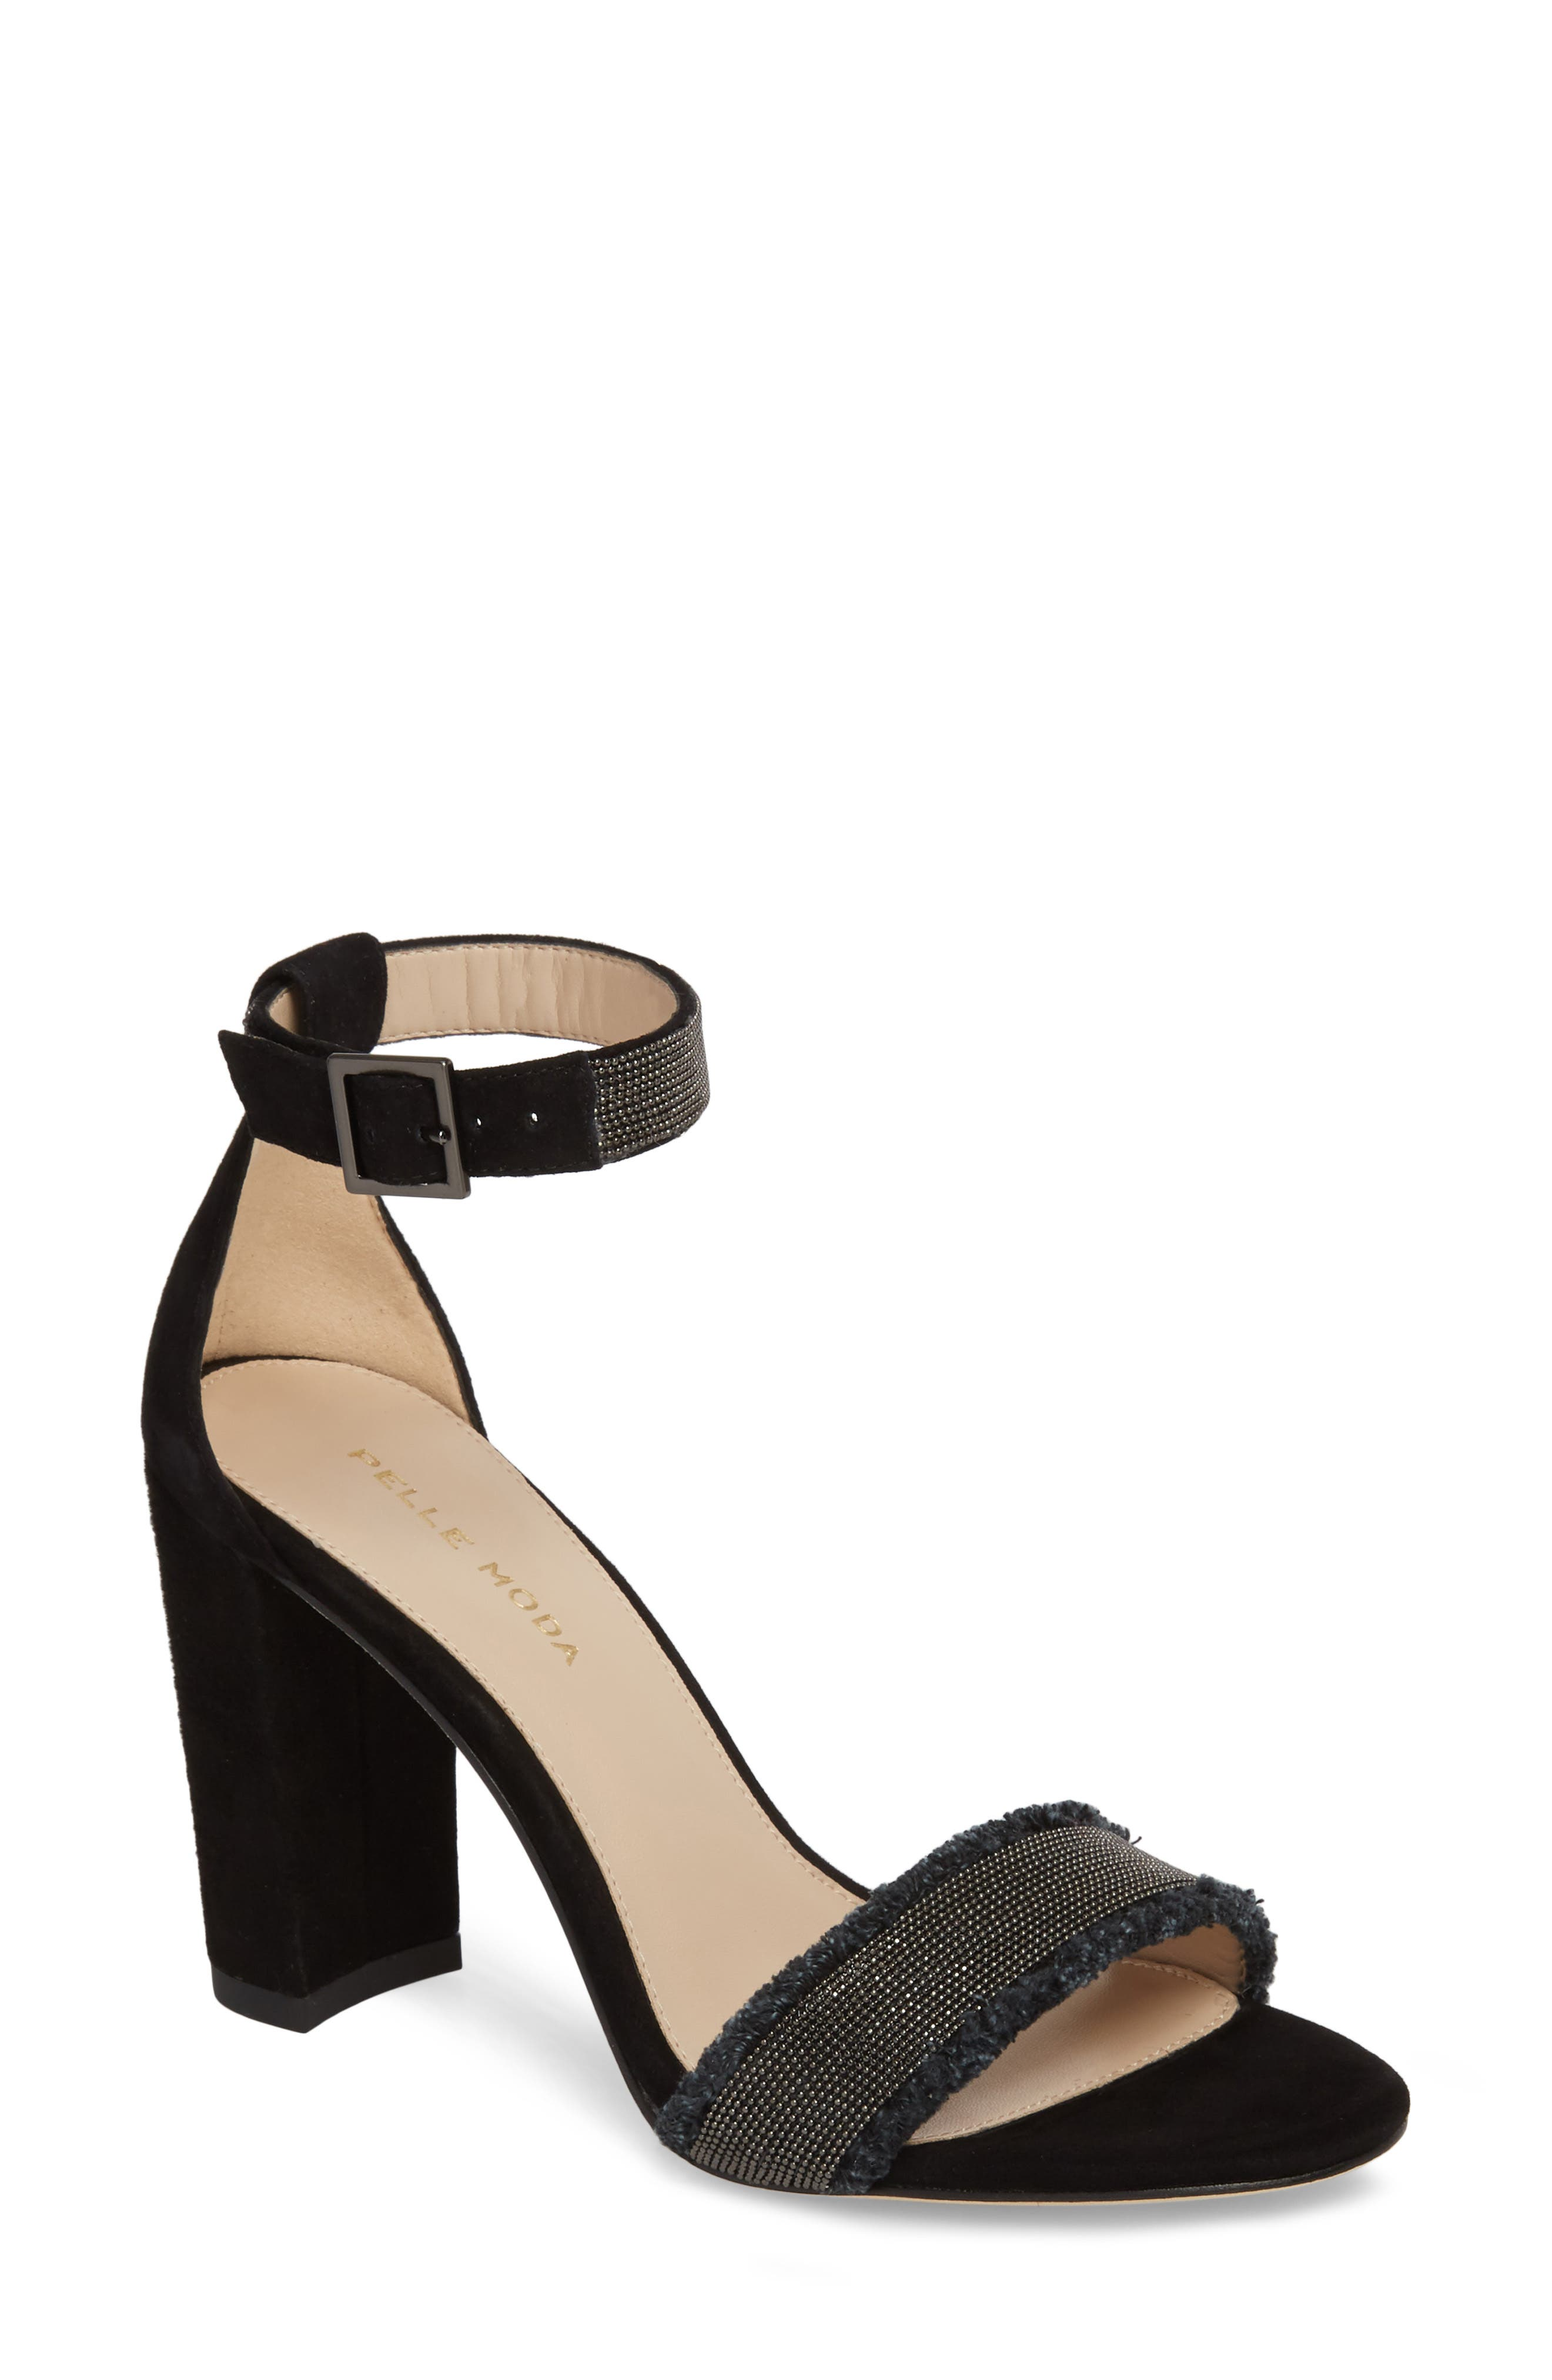 PELLE MODA,                             Bonnie6 Embellished Sandal,                             Main thumbnail 1, color,                             BLACK SUEDE